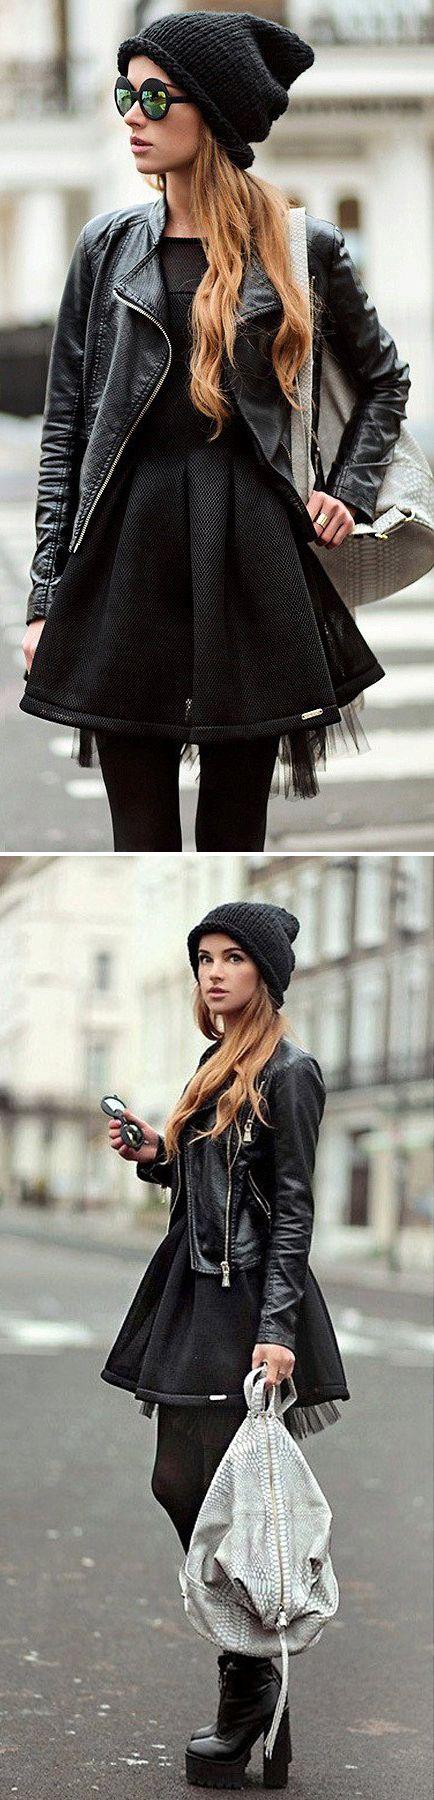 Moto Jacket + Black Dress: